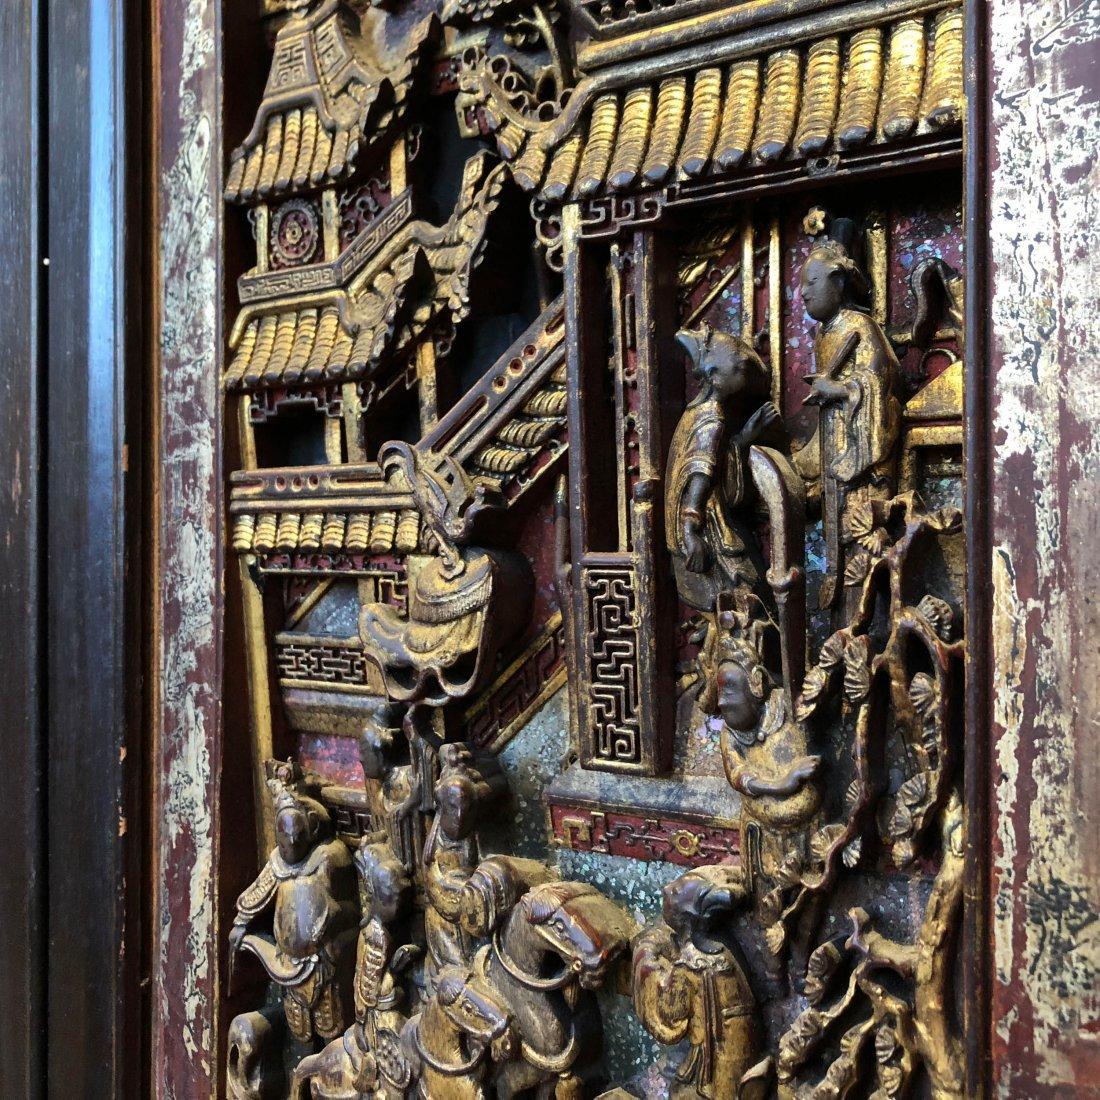 Antique Chinese Gilt & Hardwood Carved Cabinet - 8